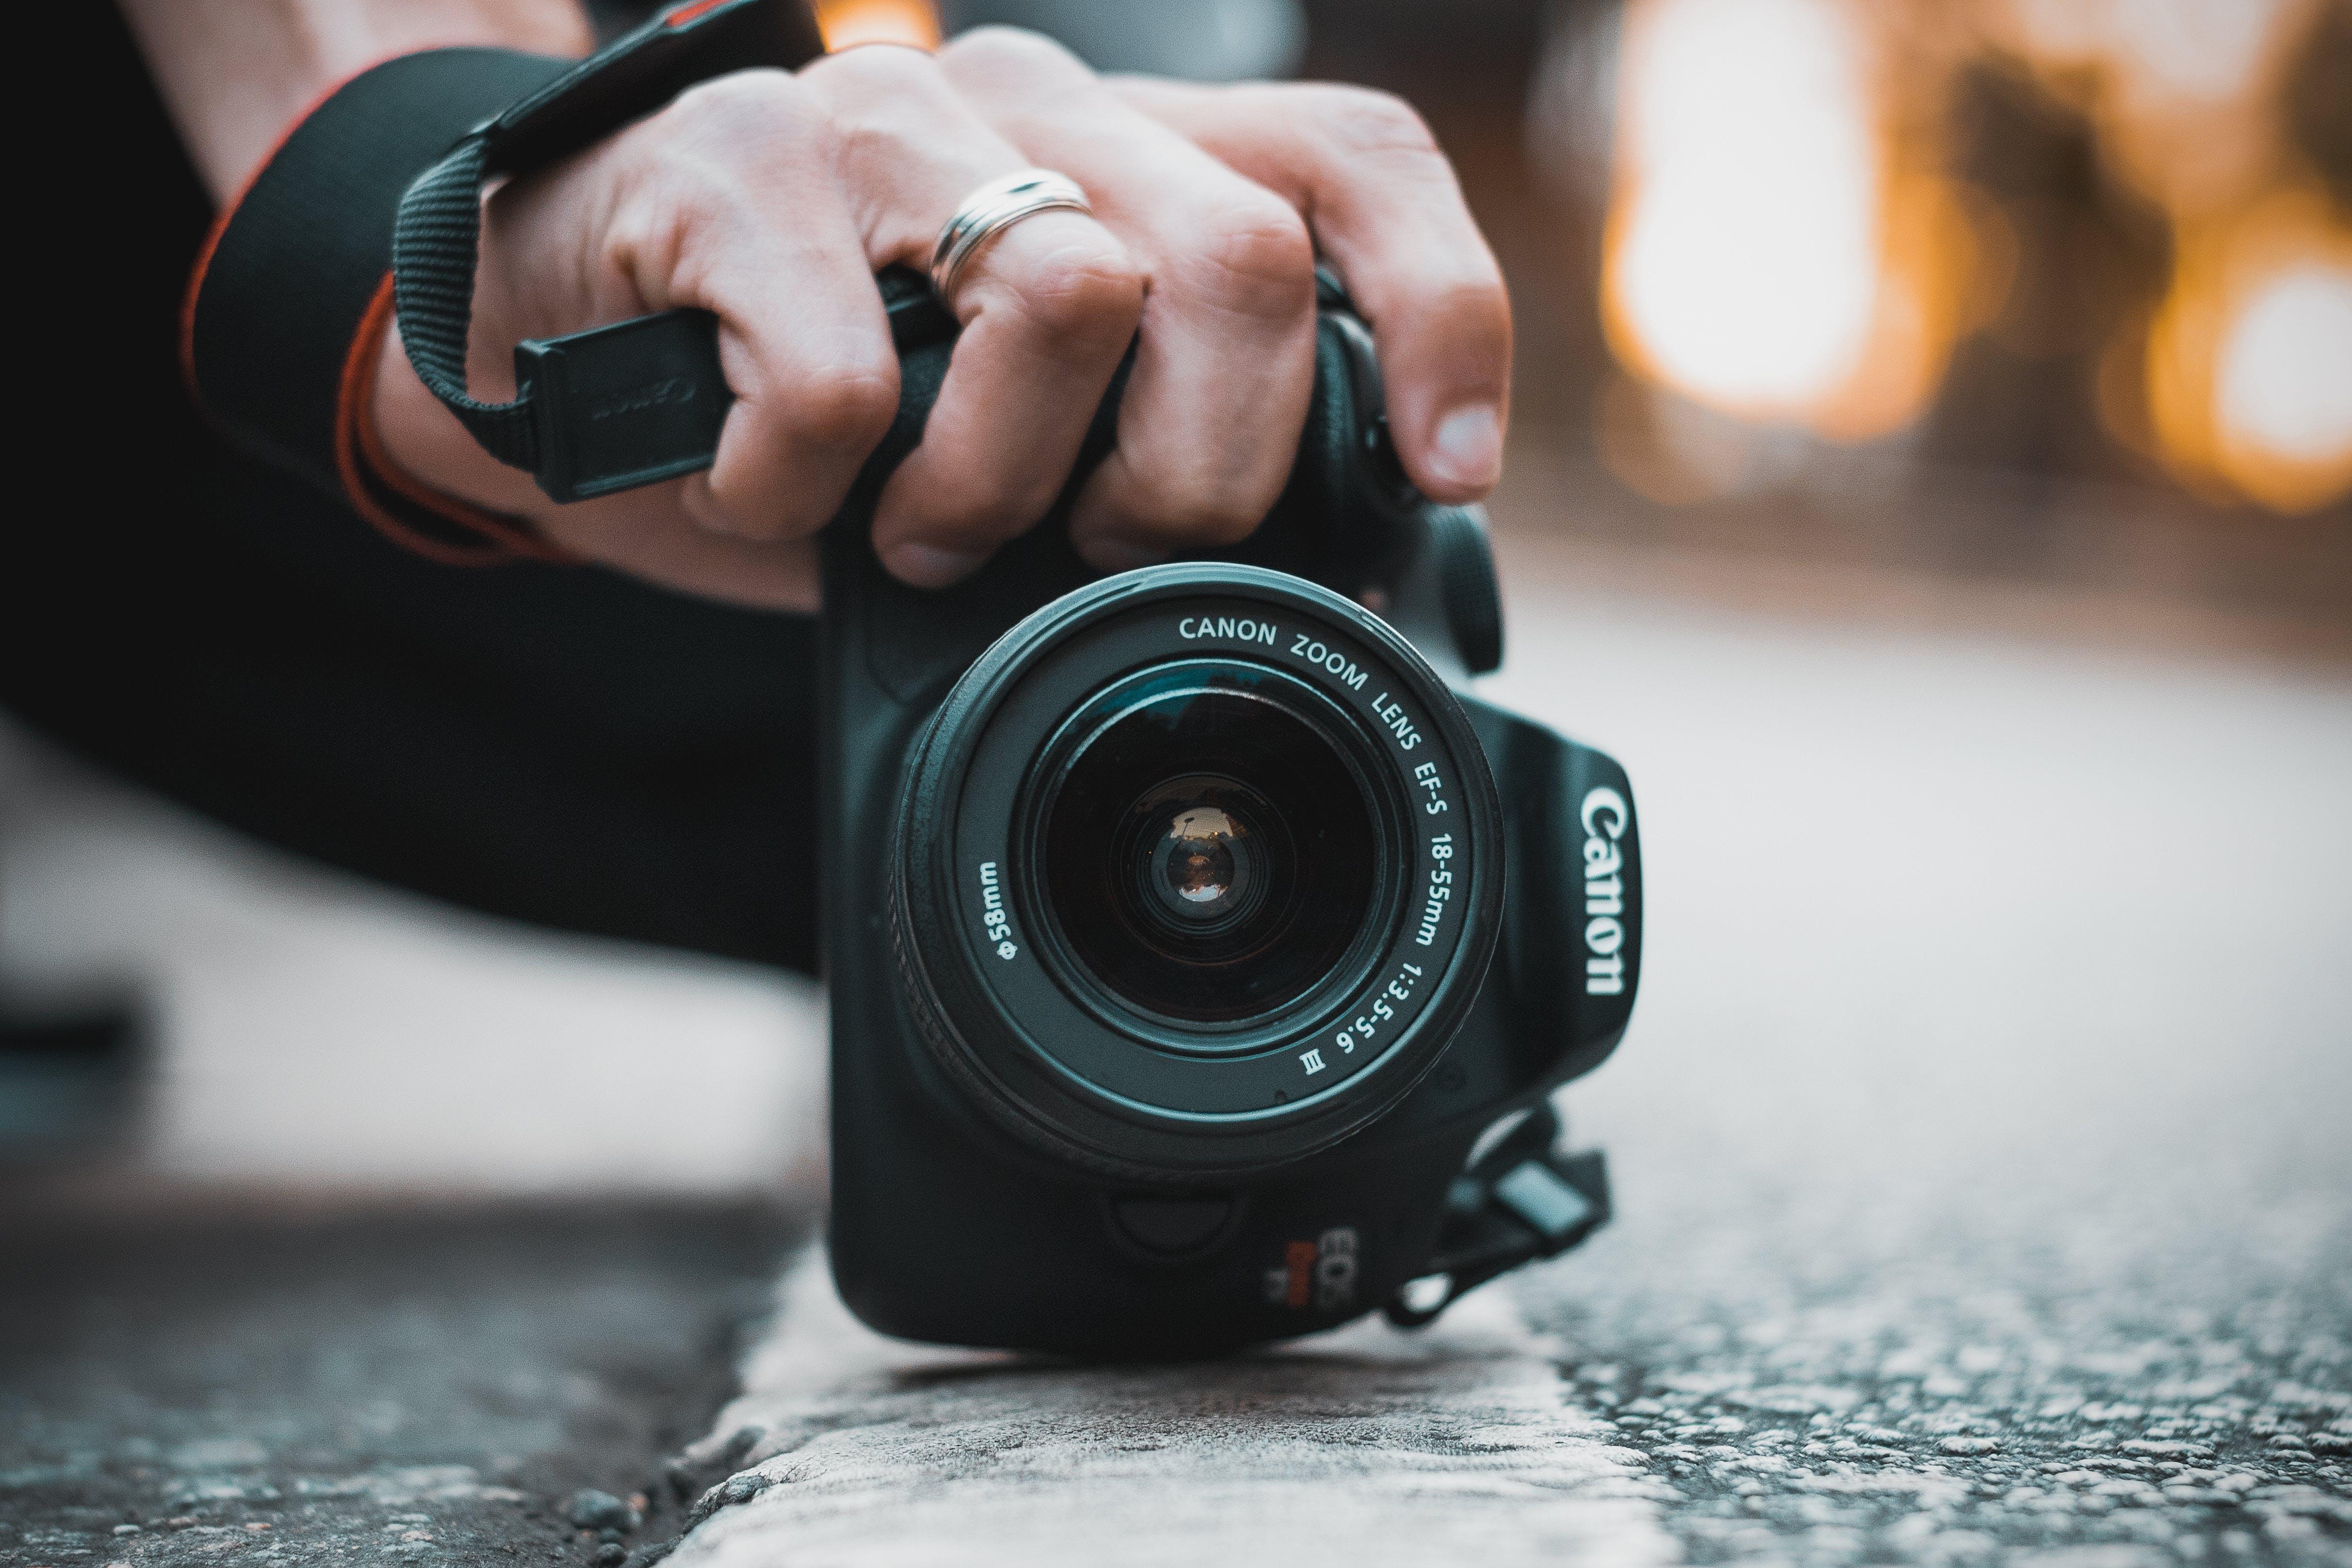 Close-Up Photo of Canon Dslr Camera